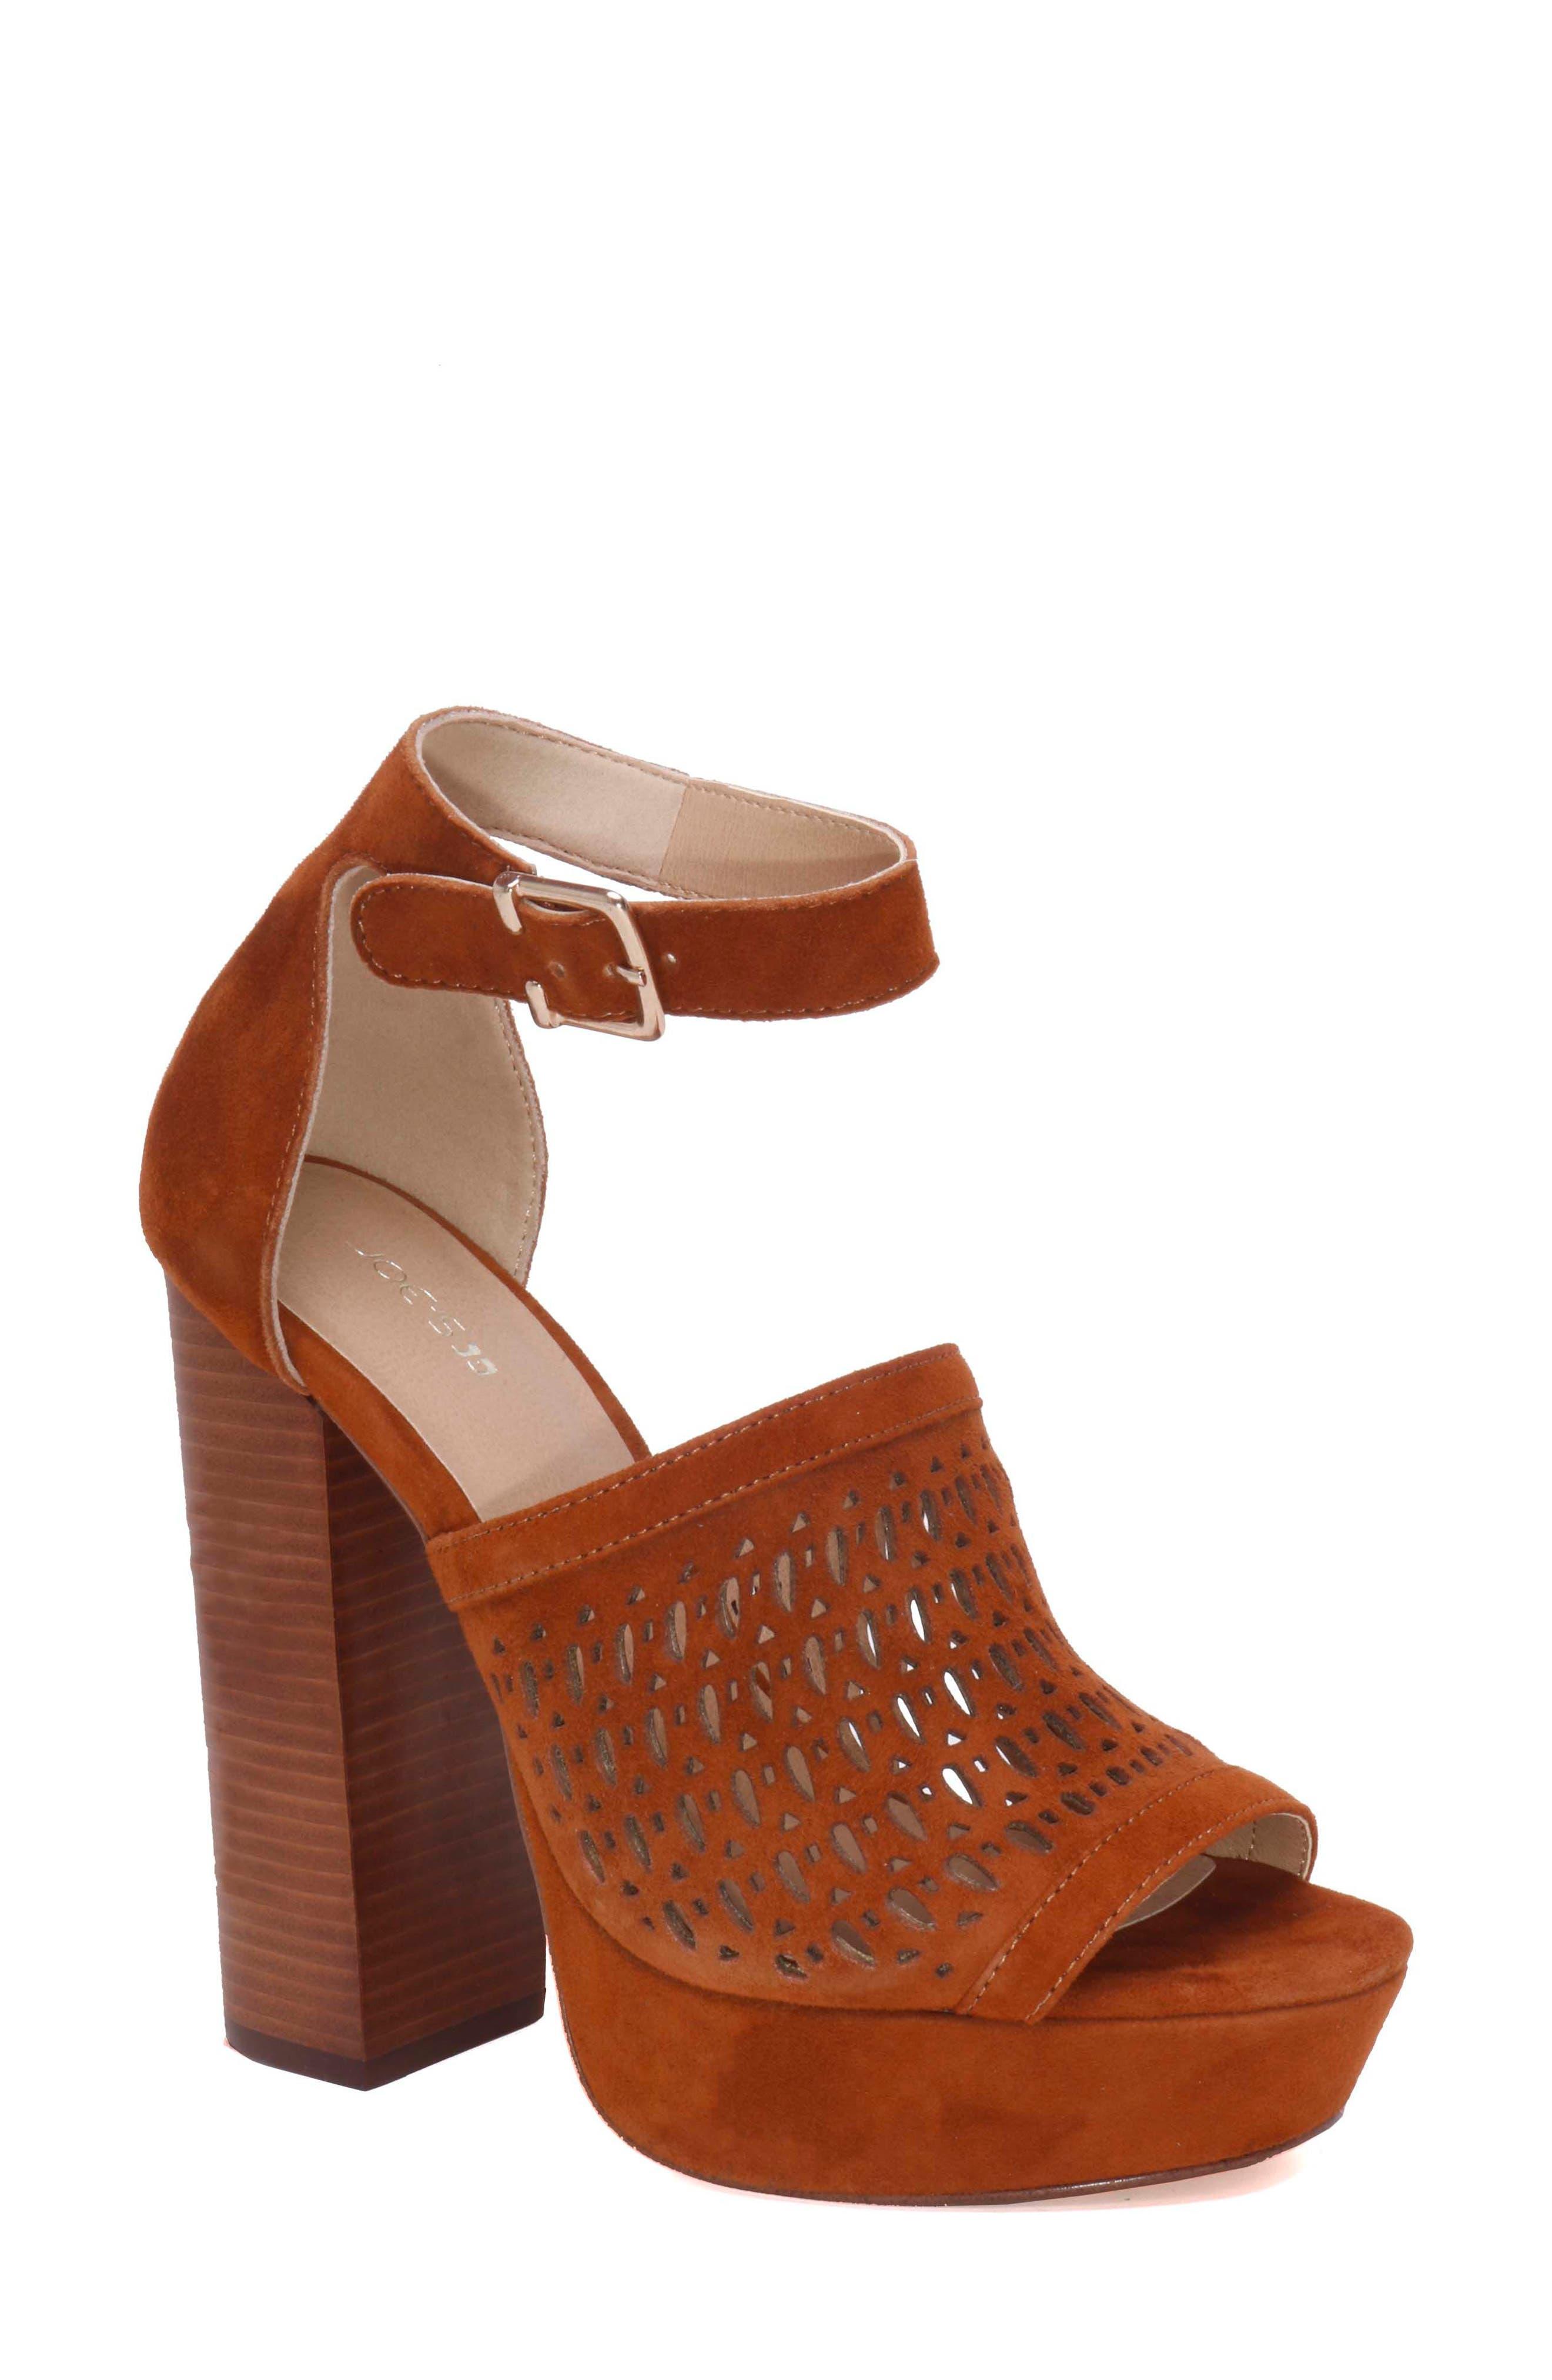 Alternate Image 1 Selected - Joe's Lorne Platform Sandal (Women)